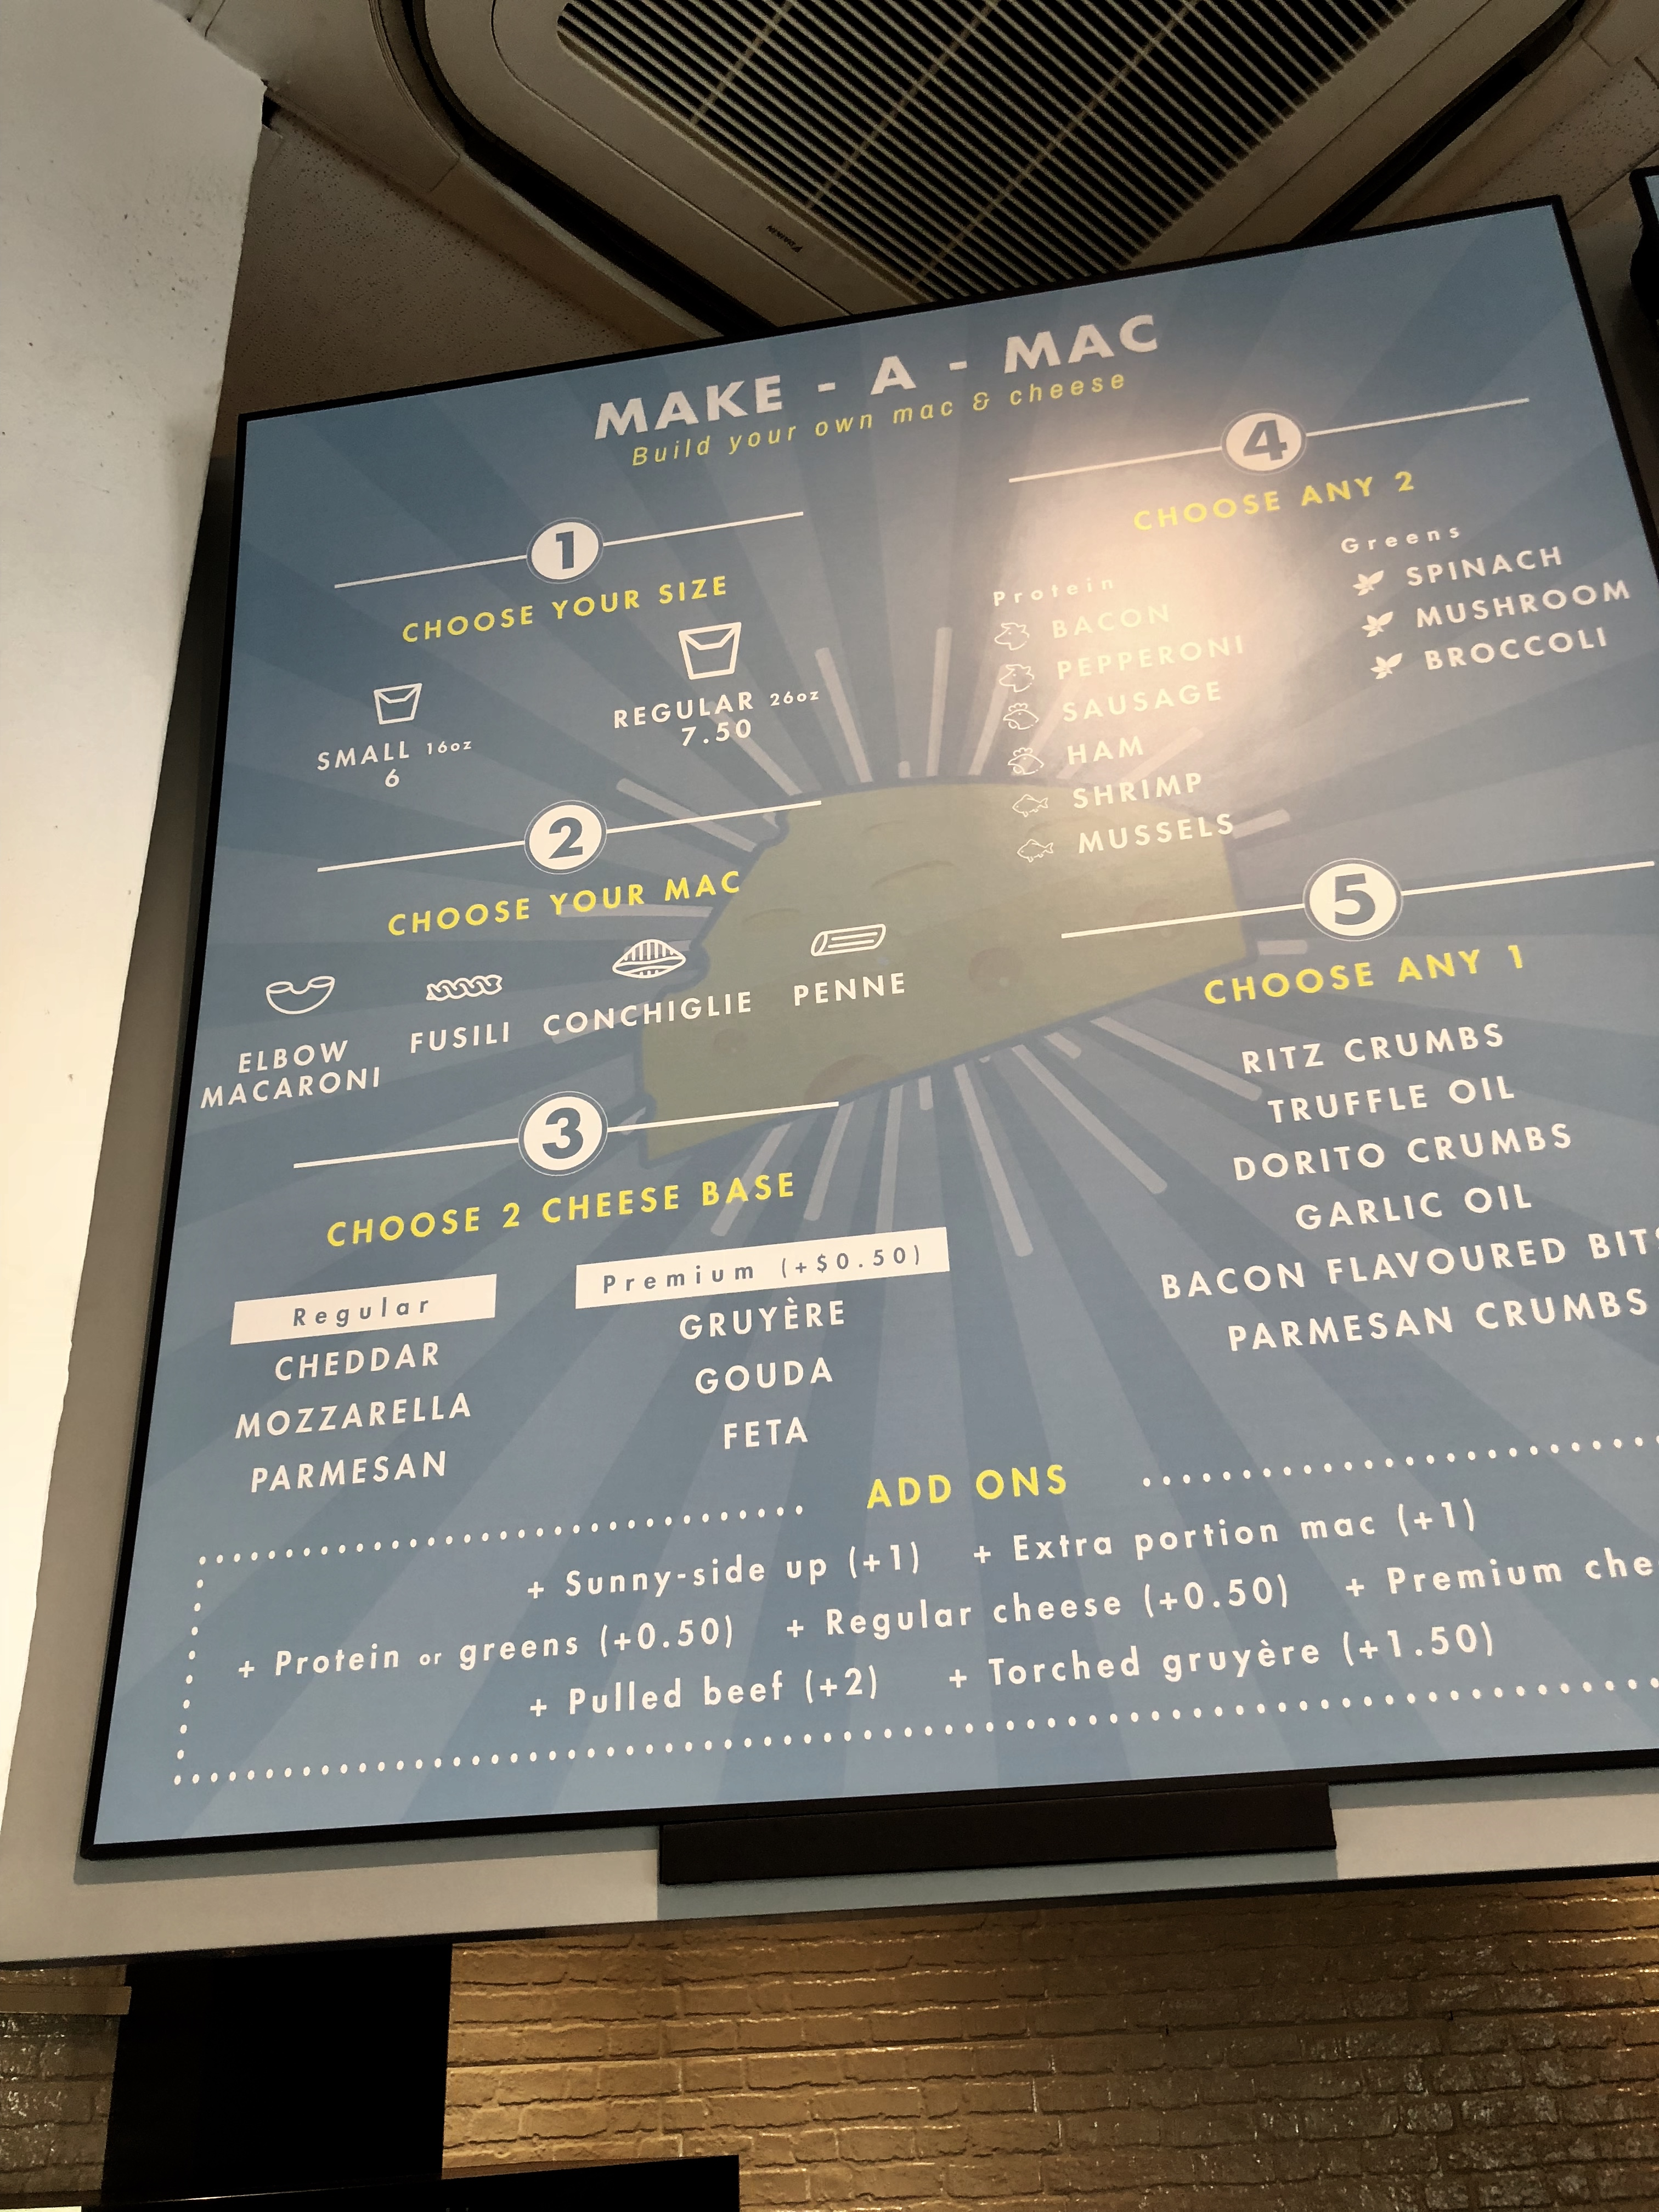 The_Big_Cheese_Build_A_Mac_Menu